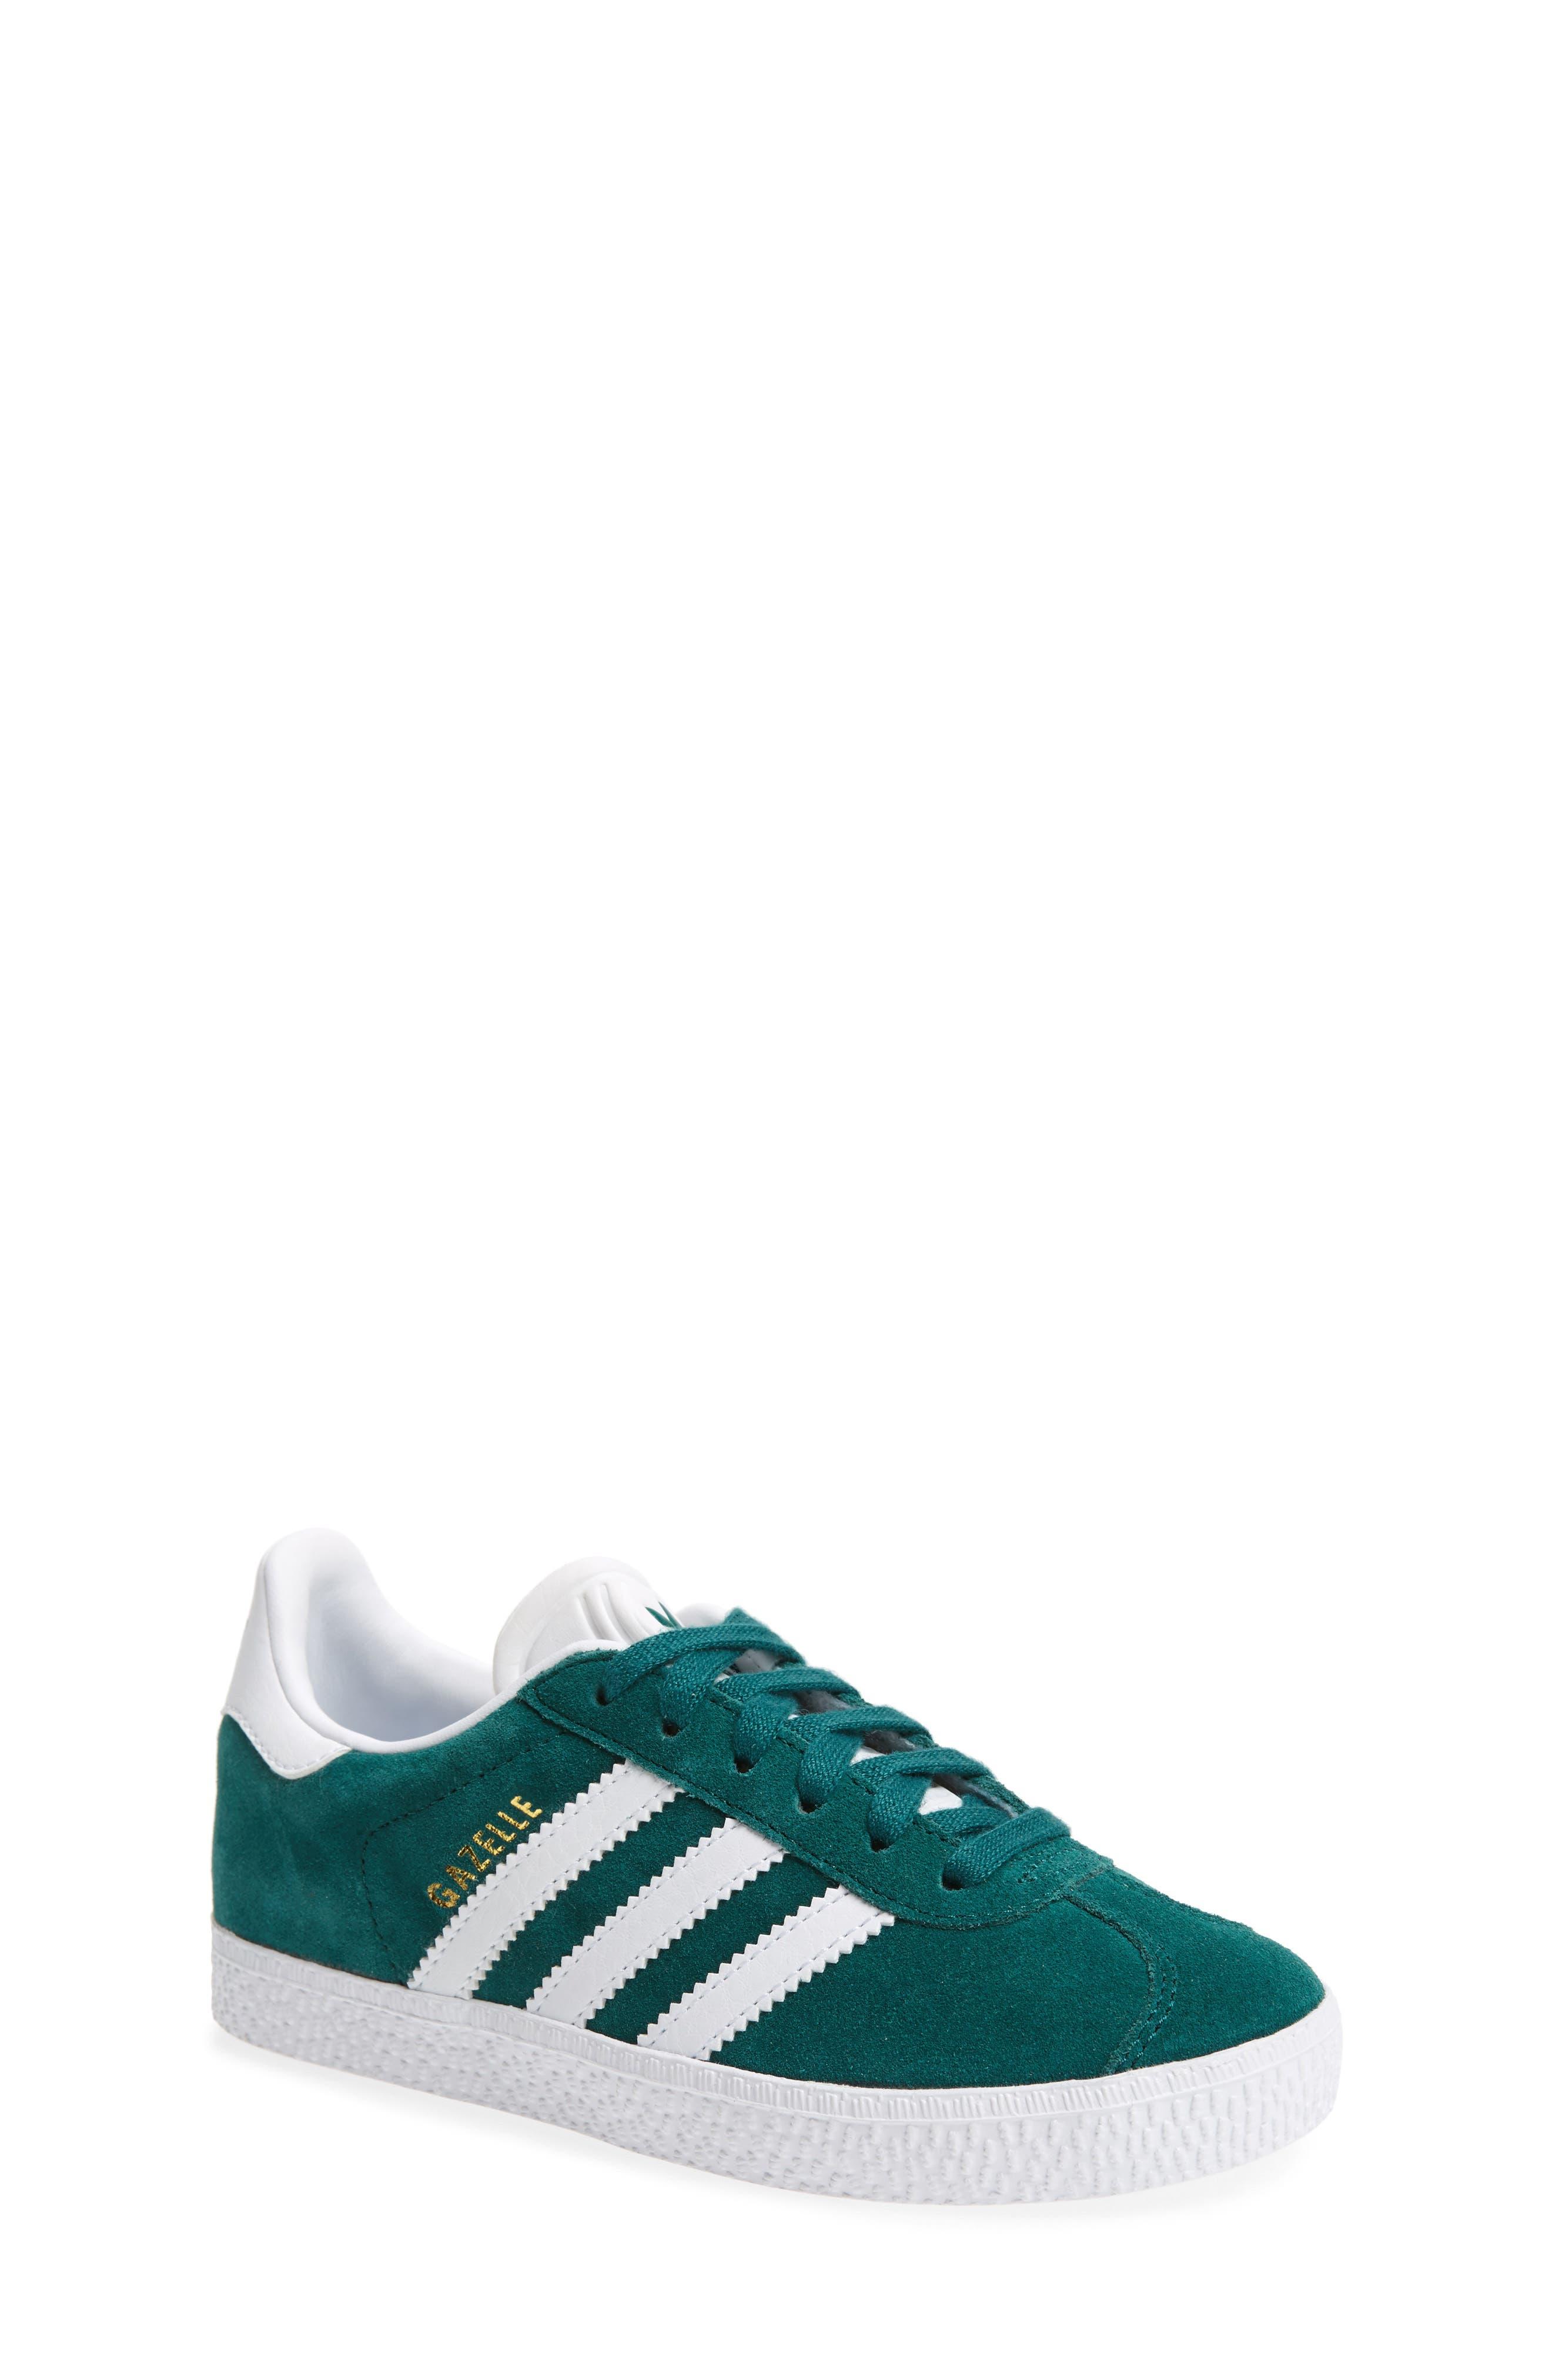 Gazelle Sneaker,                             Main thumbnail 1, color,                             Noble Green/ White